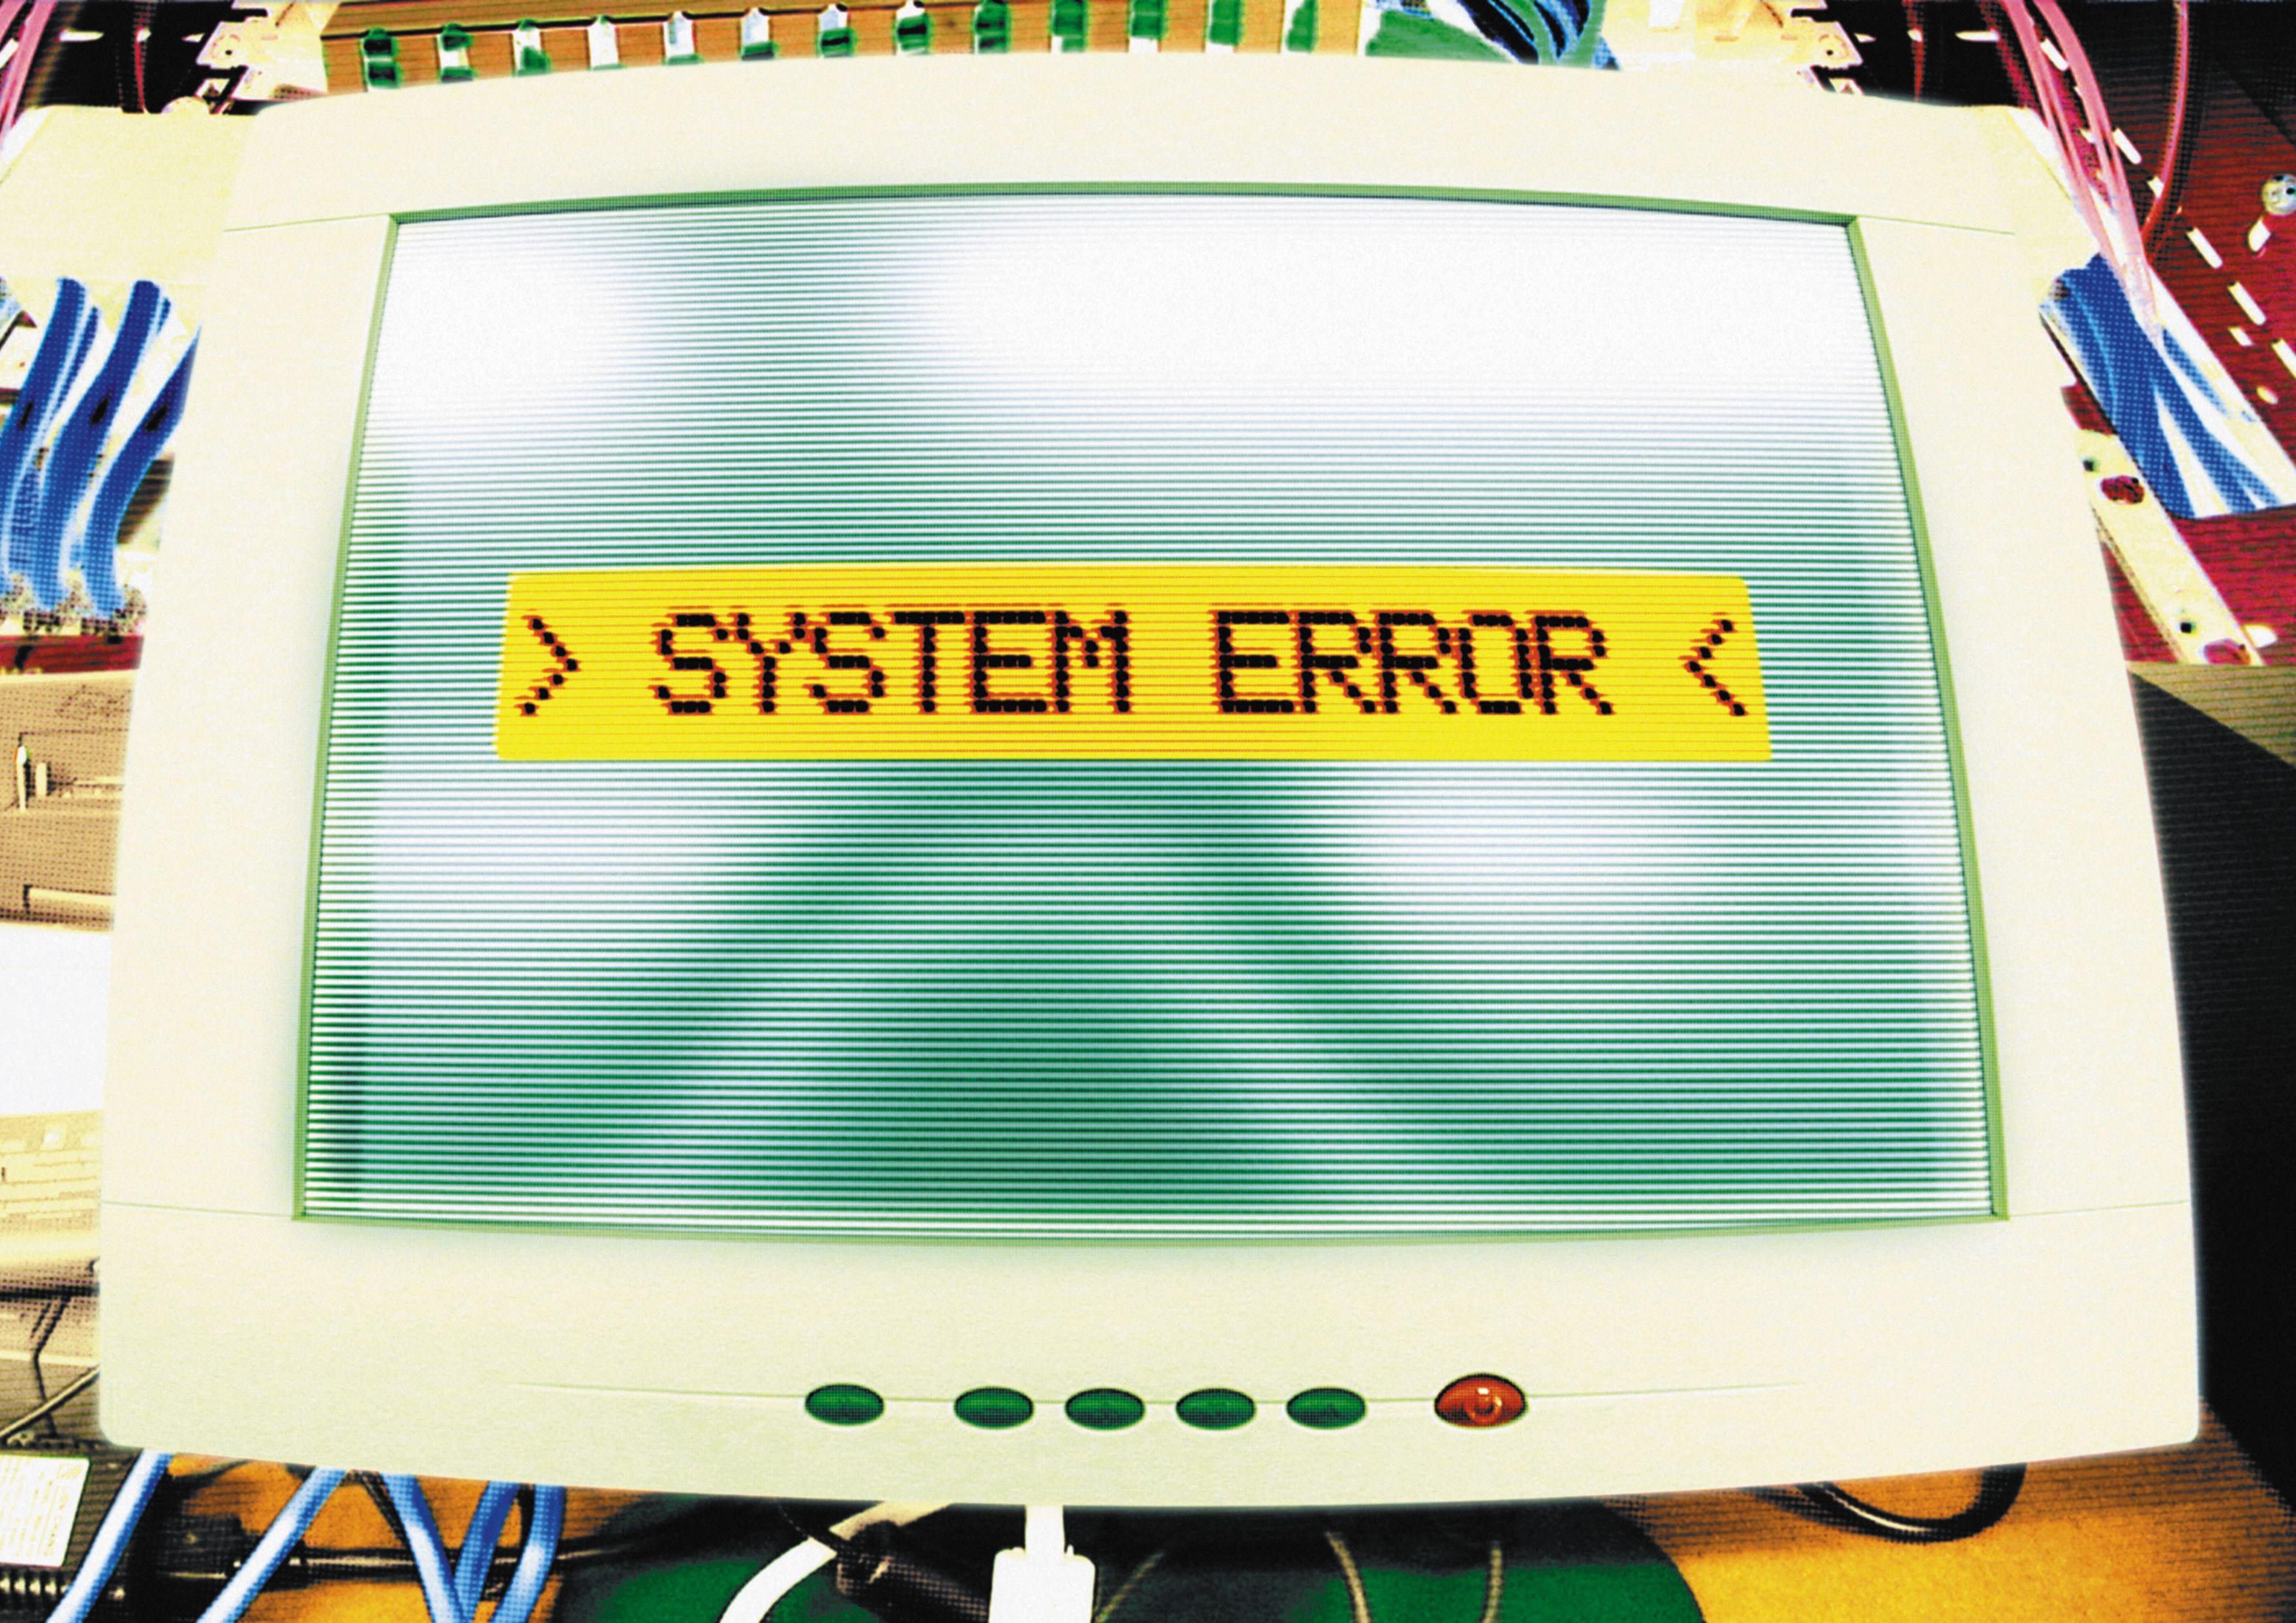 system error written on a monitor